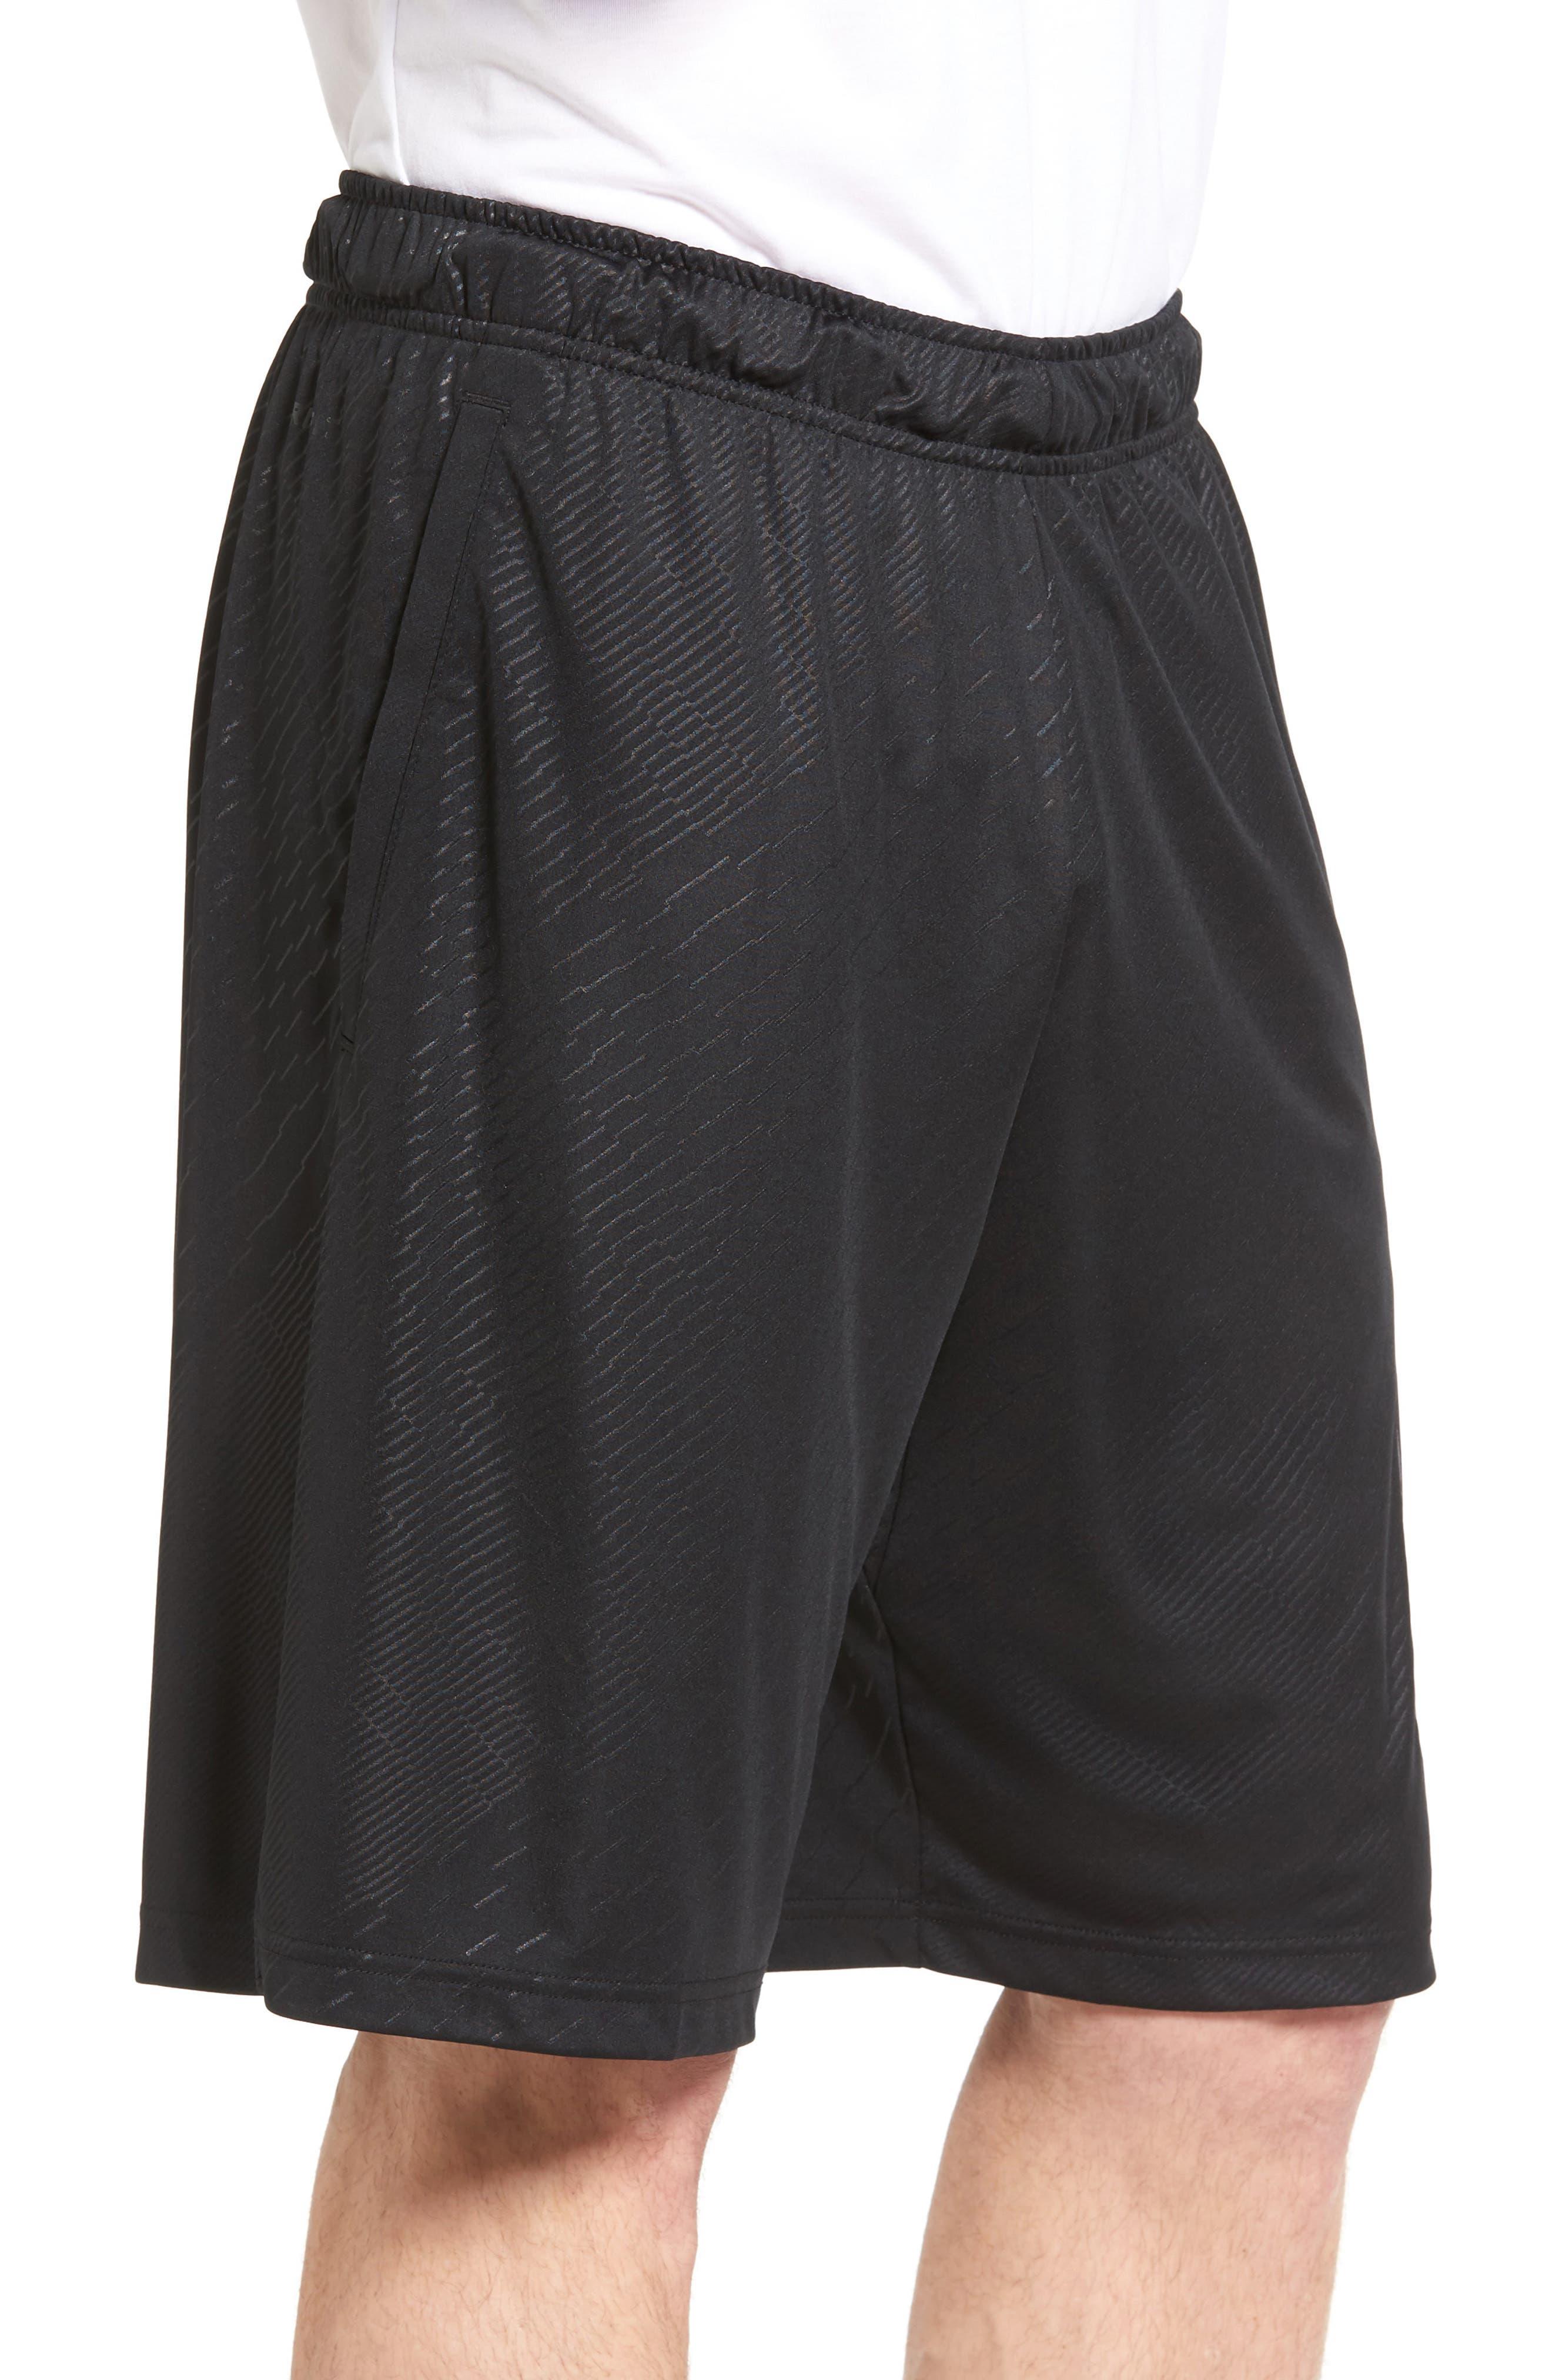 Dry Training Shorts,                             Alternate thumbnail 3, color,                             010